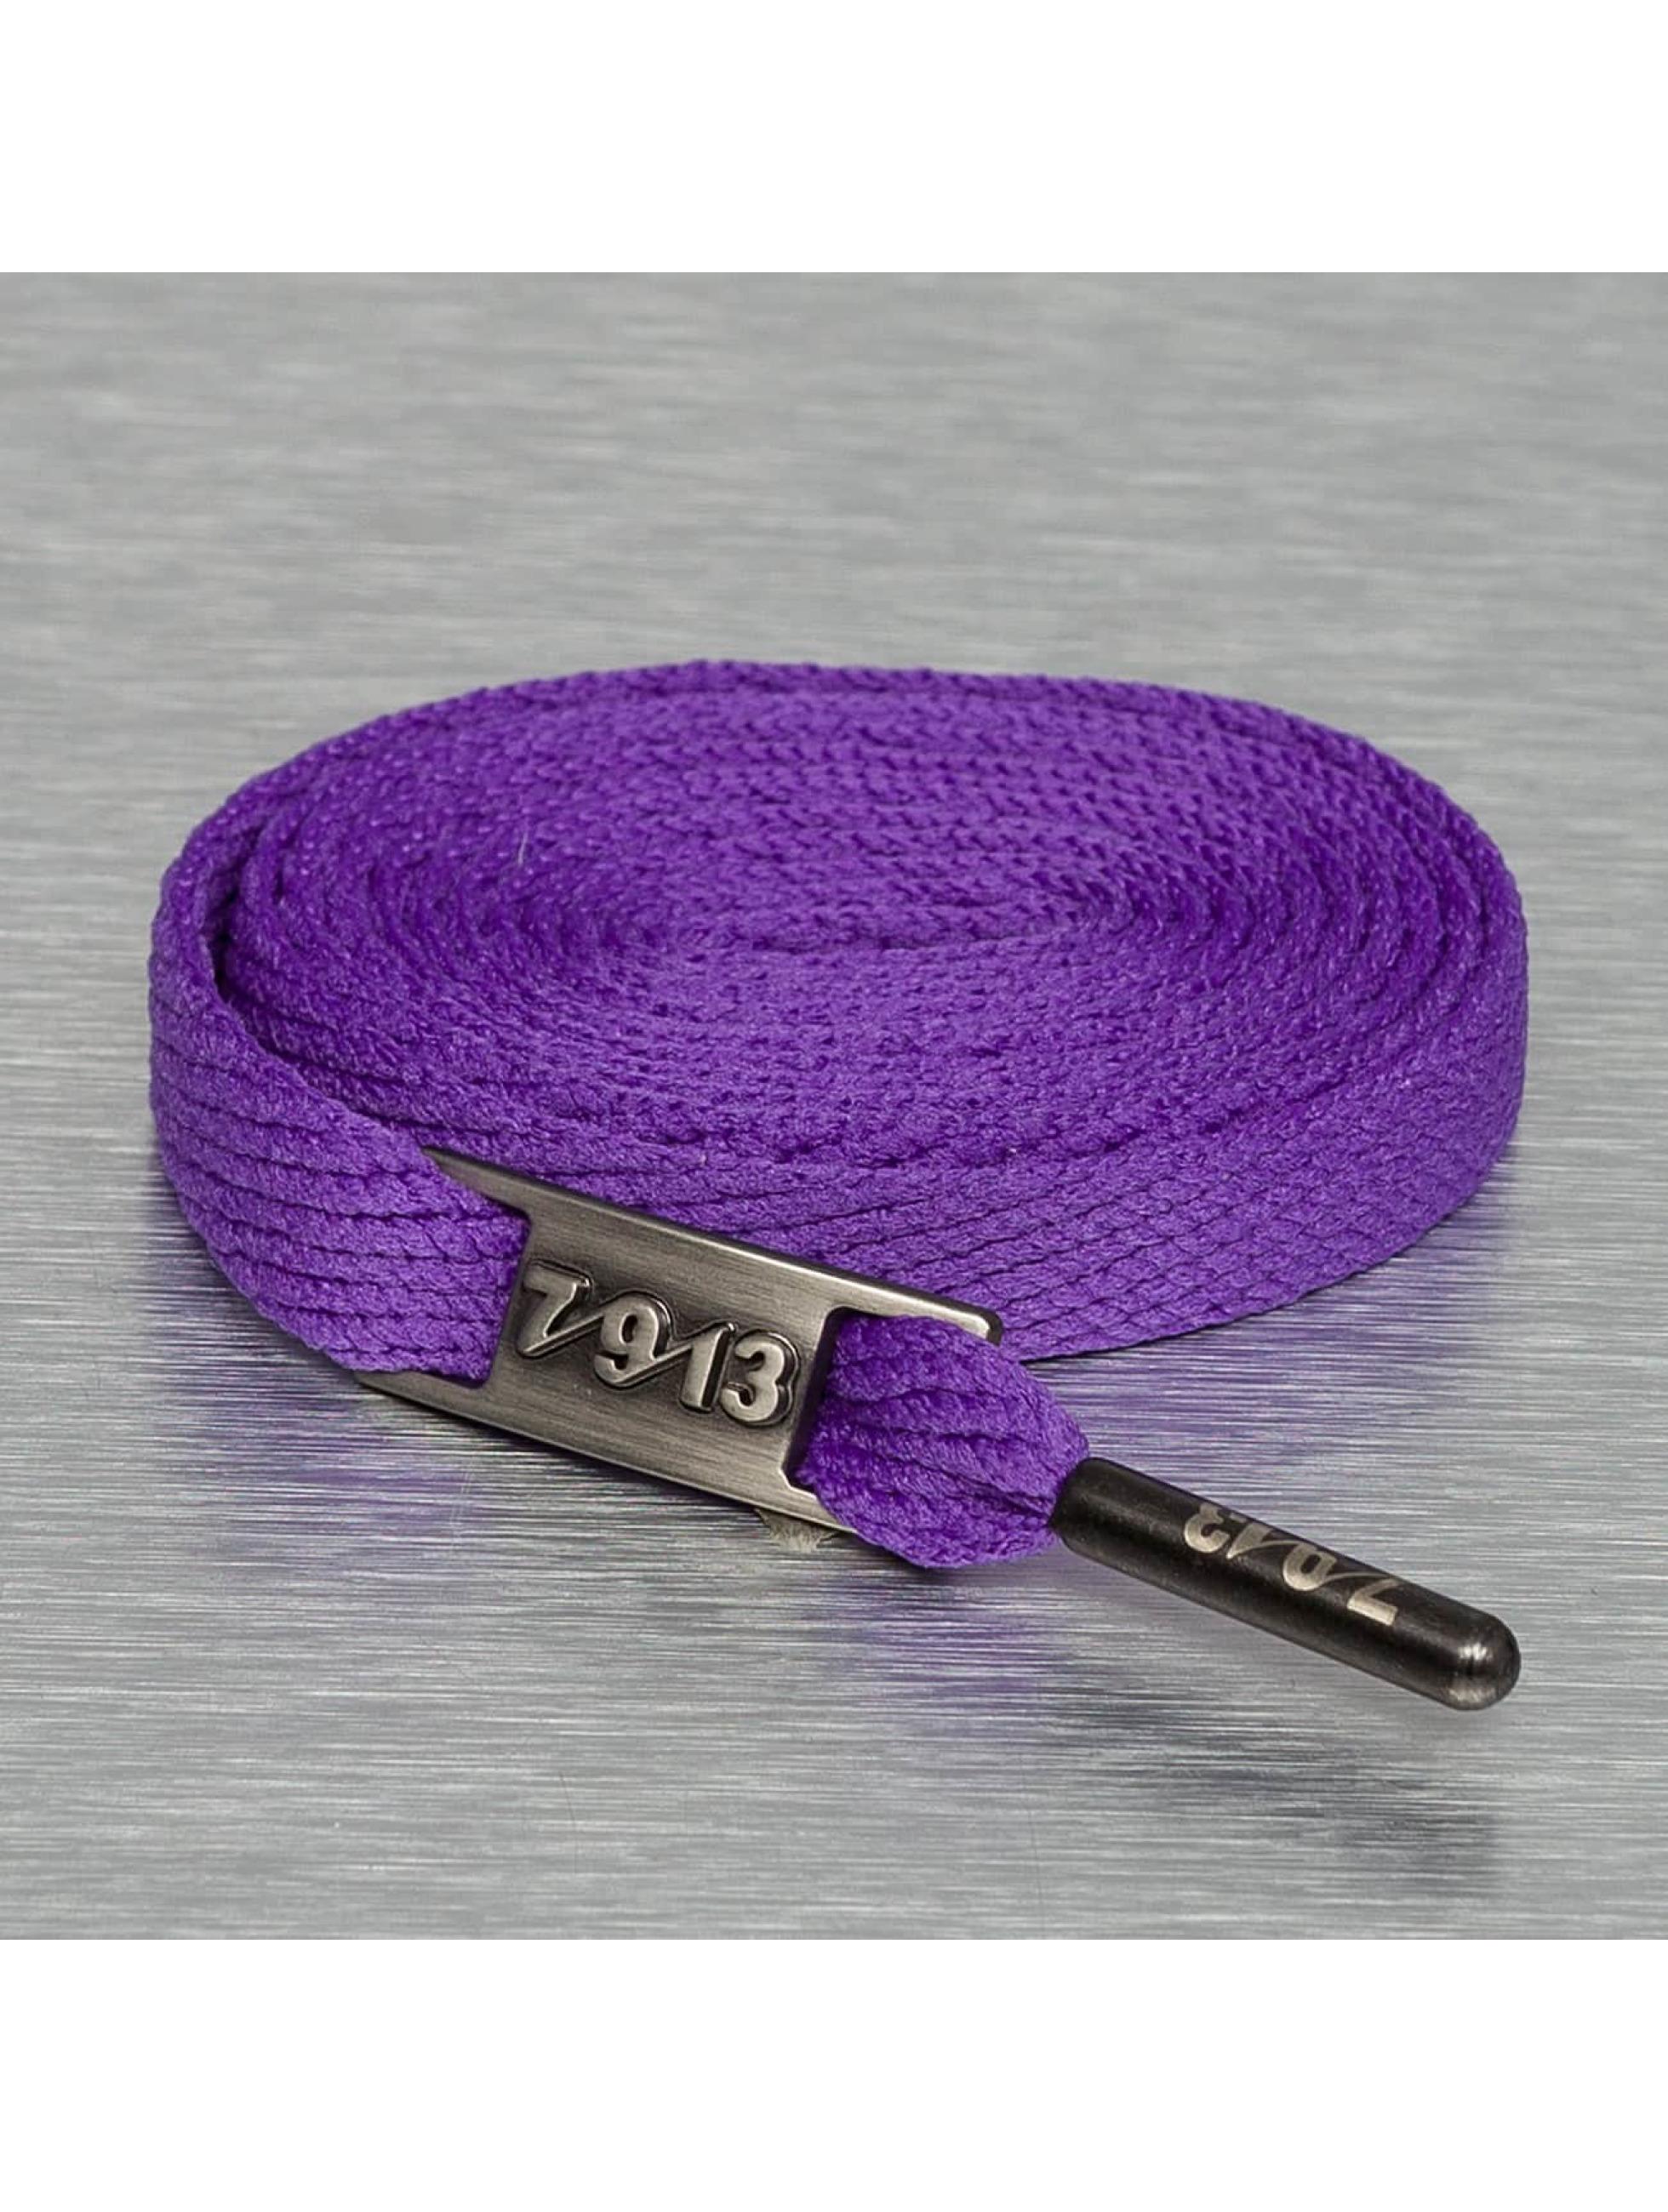 Seven Nine 13 Аксессуар для обуви Full Metal пурпурный